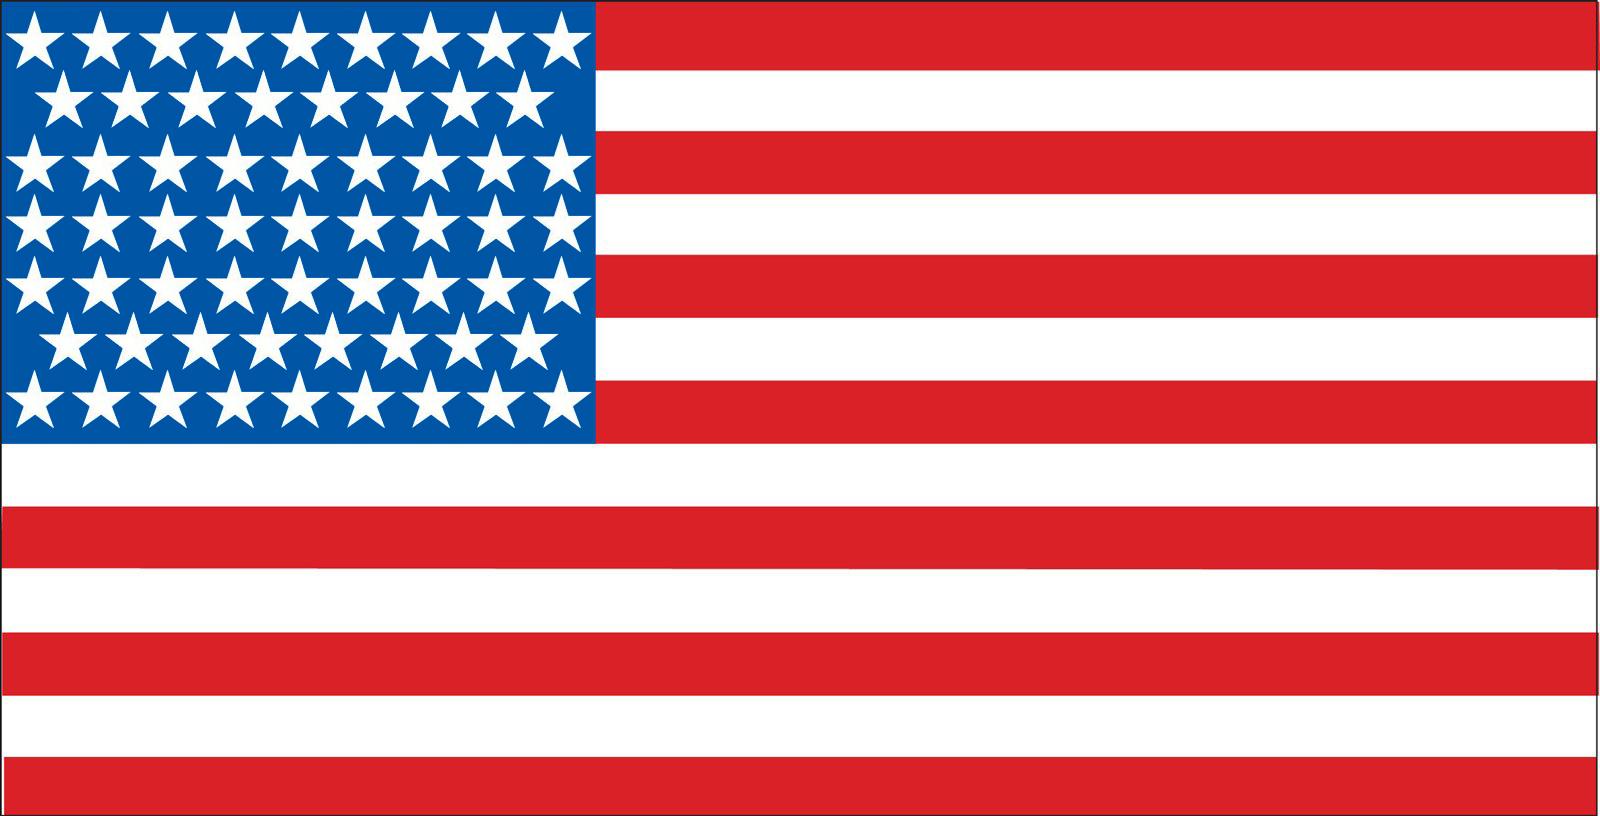 united-states-american-flag-HD-wallpaper